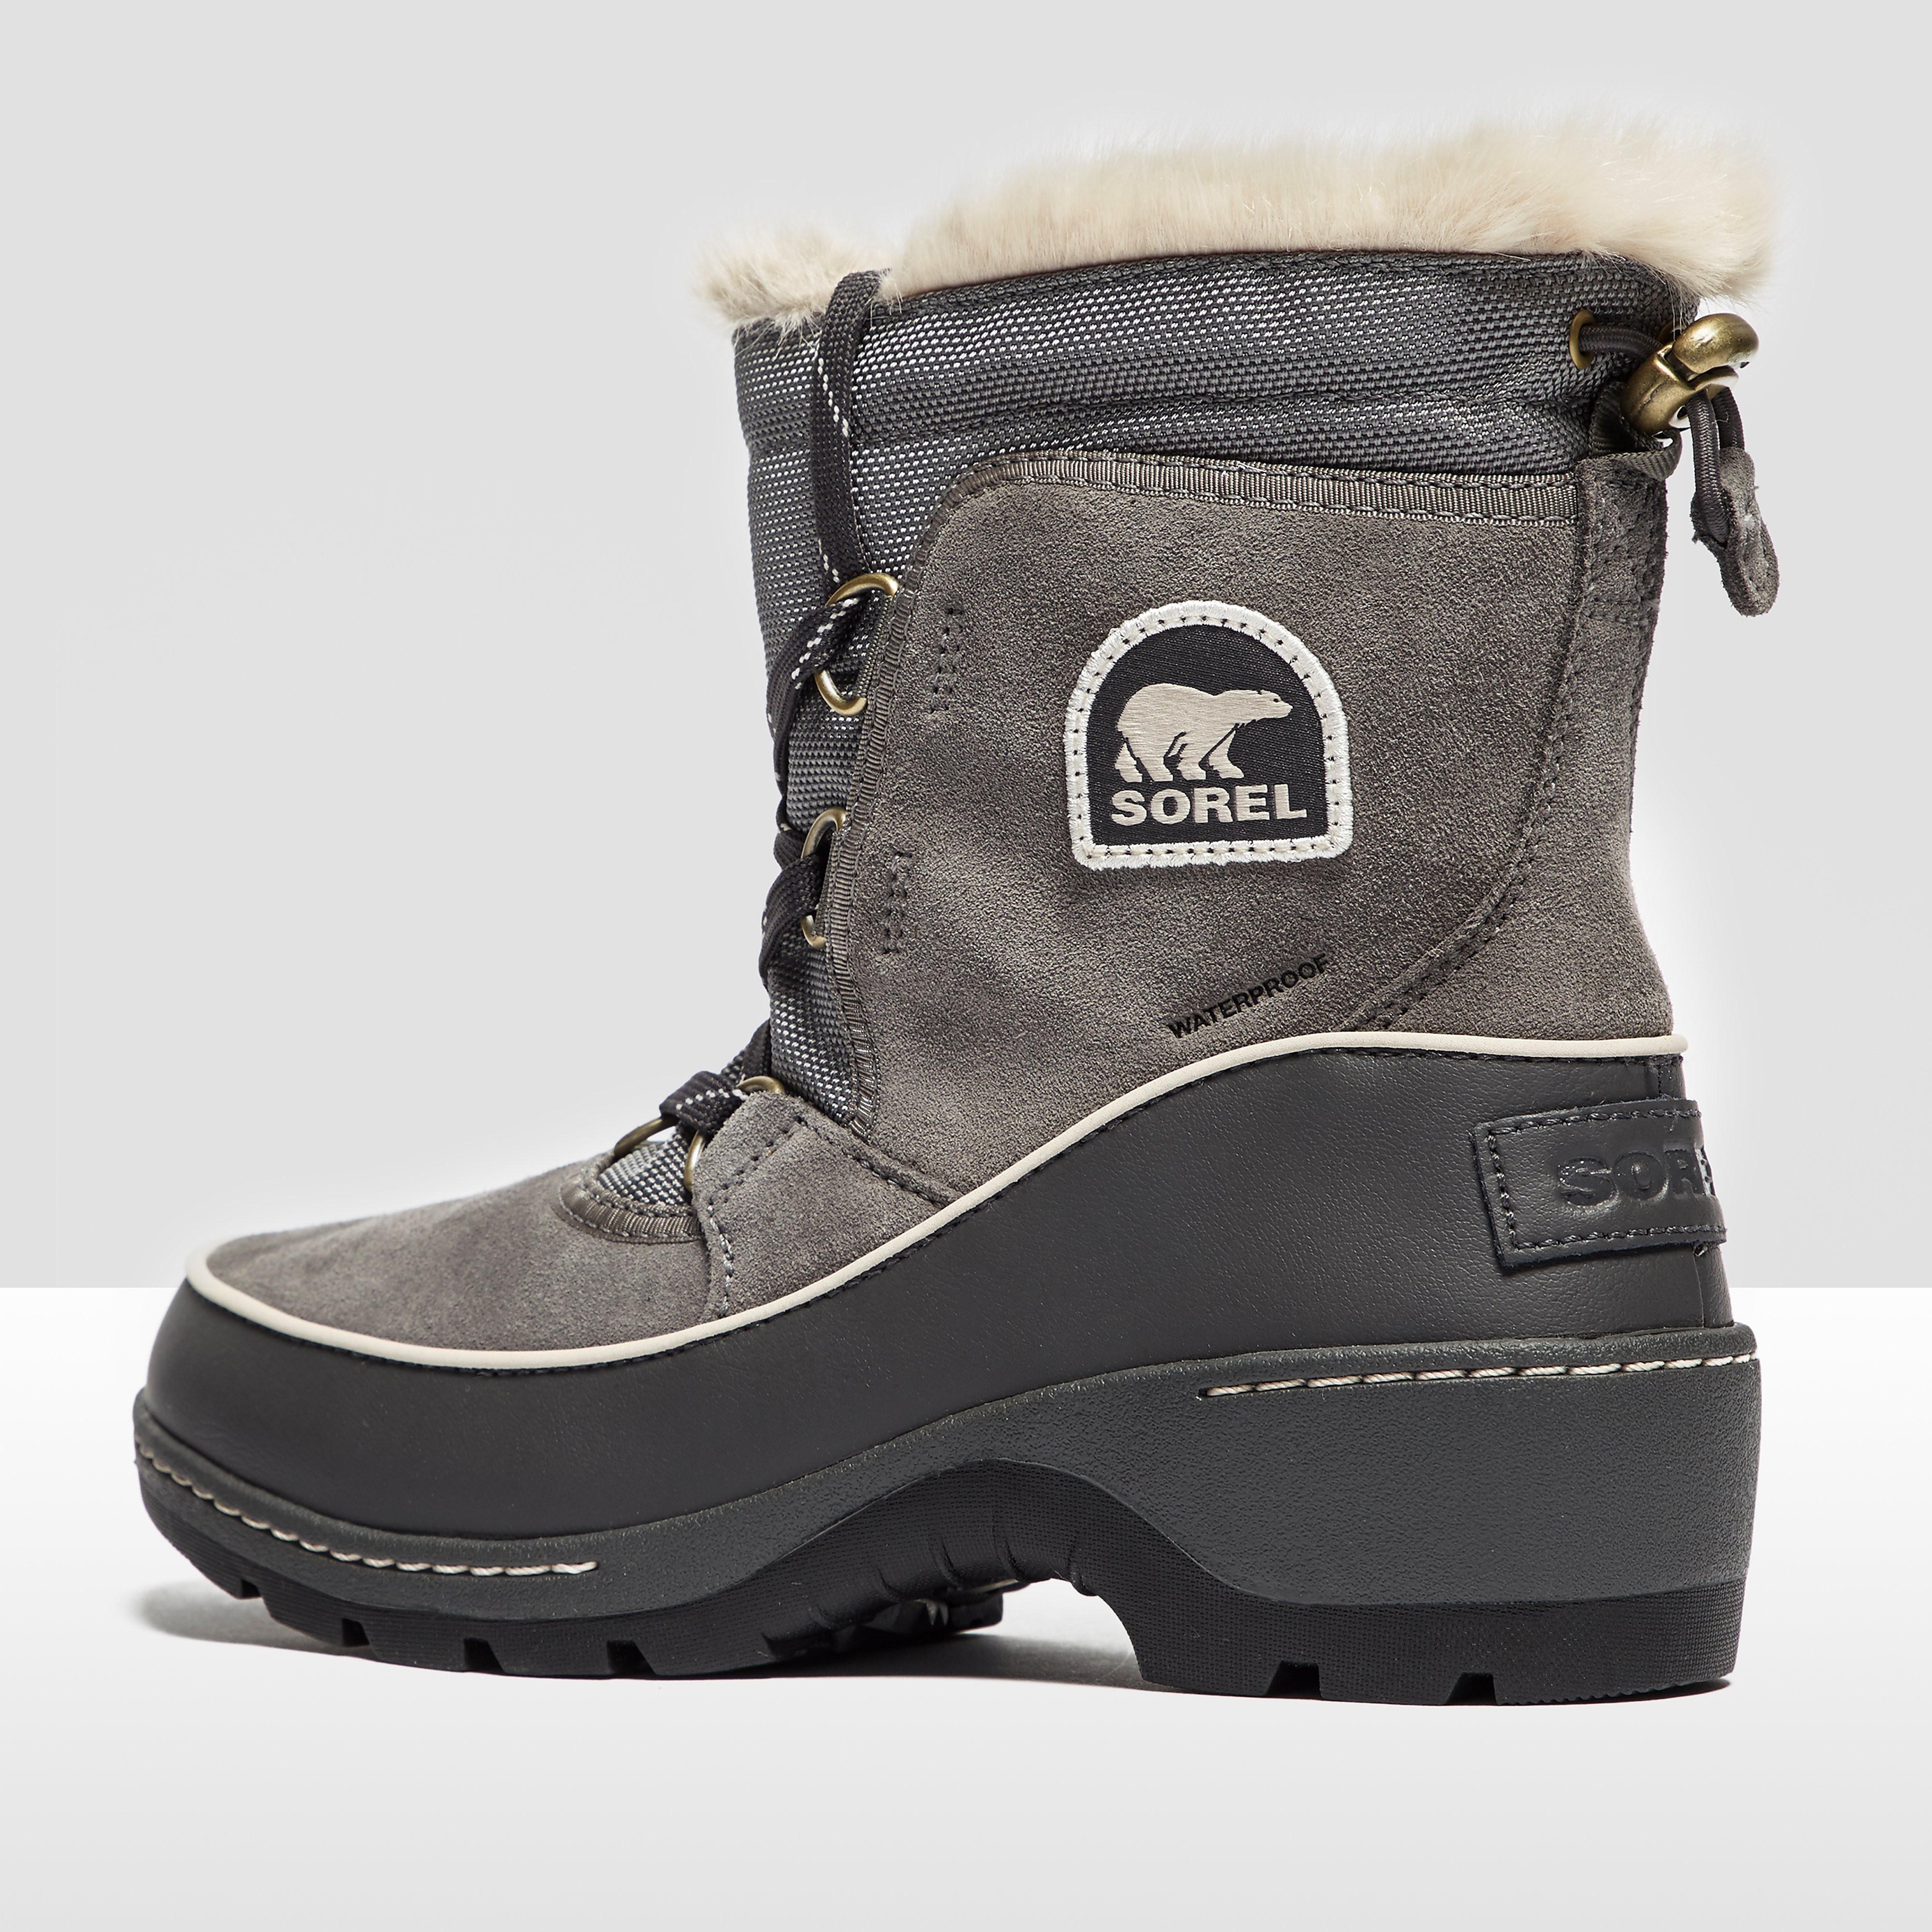 Sorel Torino Women's Boots